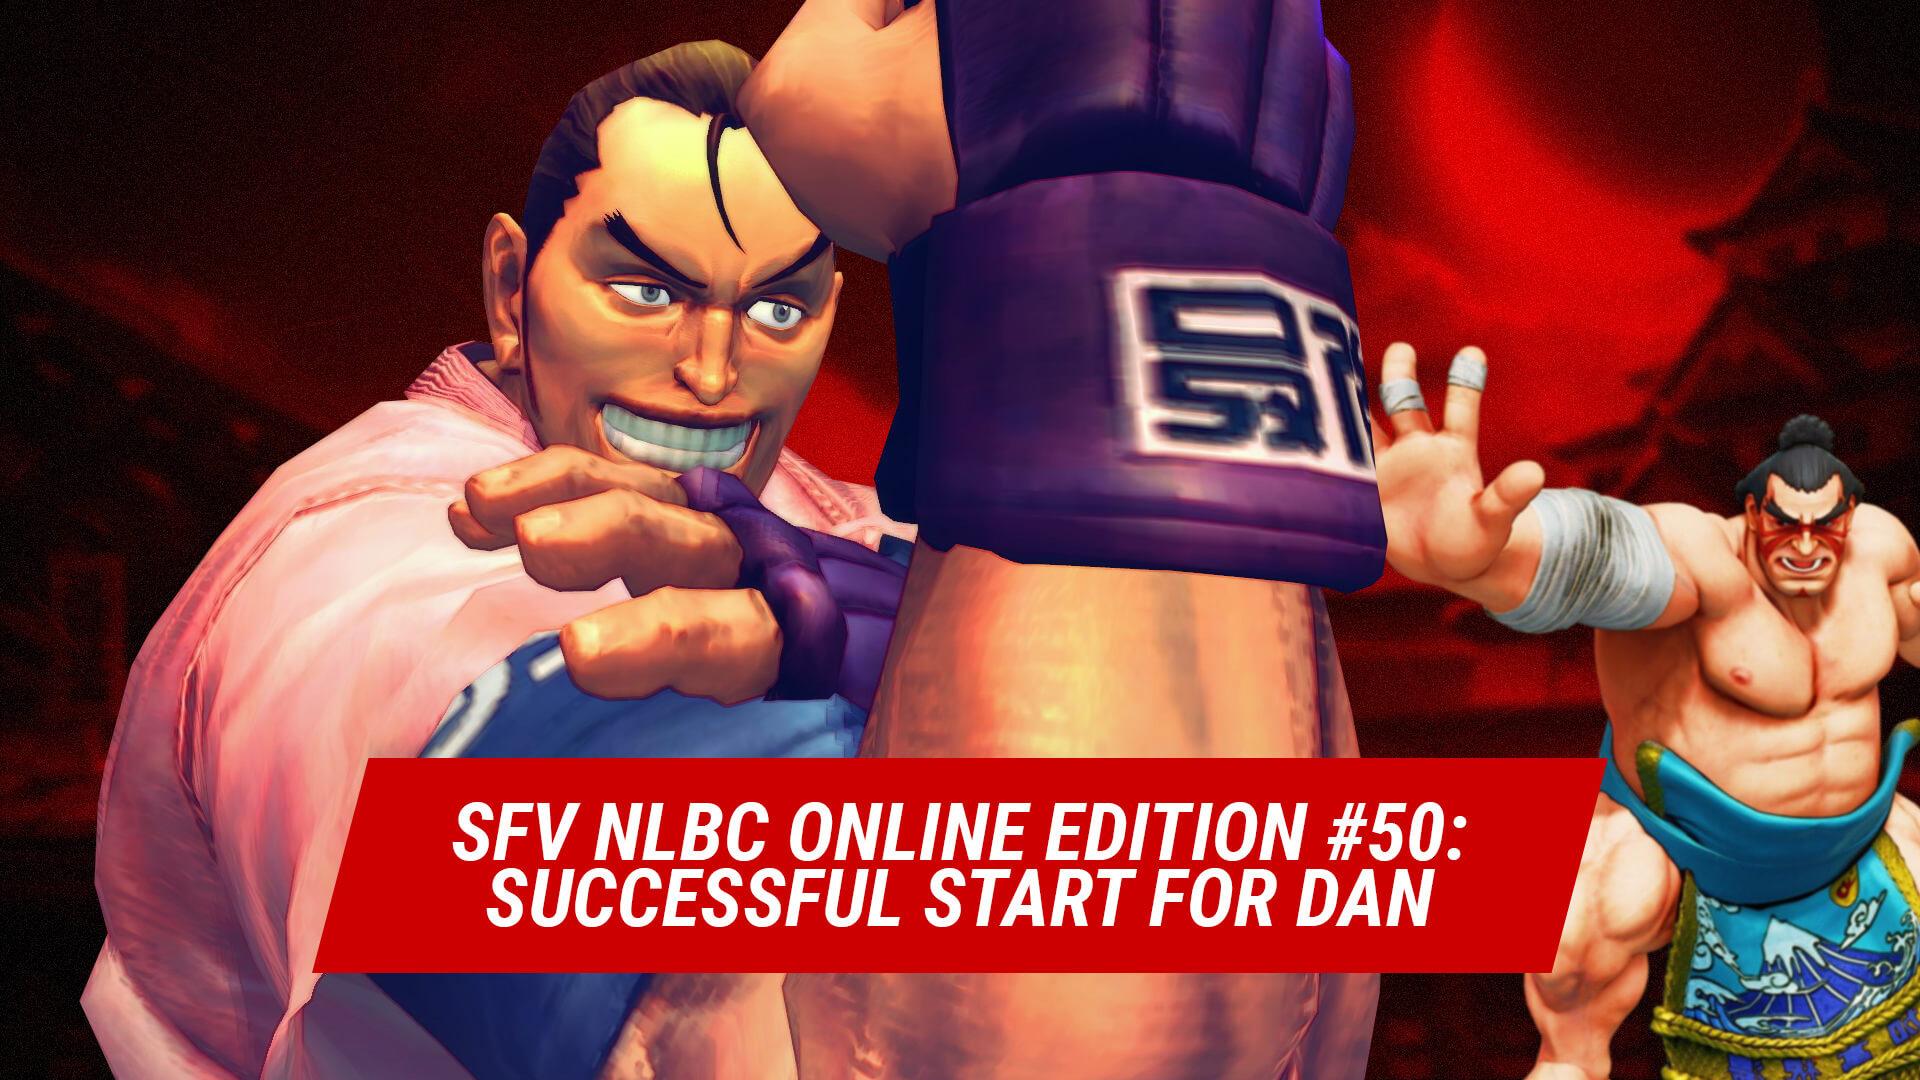 SFV NLBC Online Edition #50: Successful Start for Dan